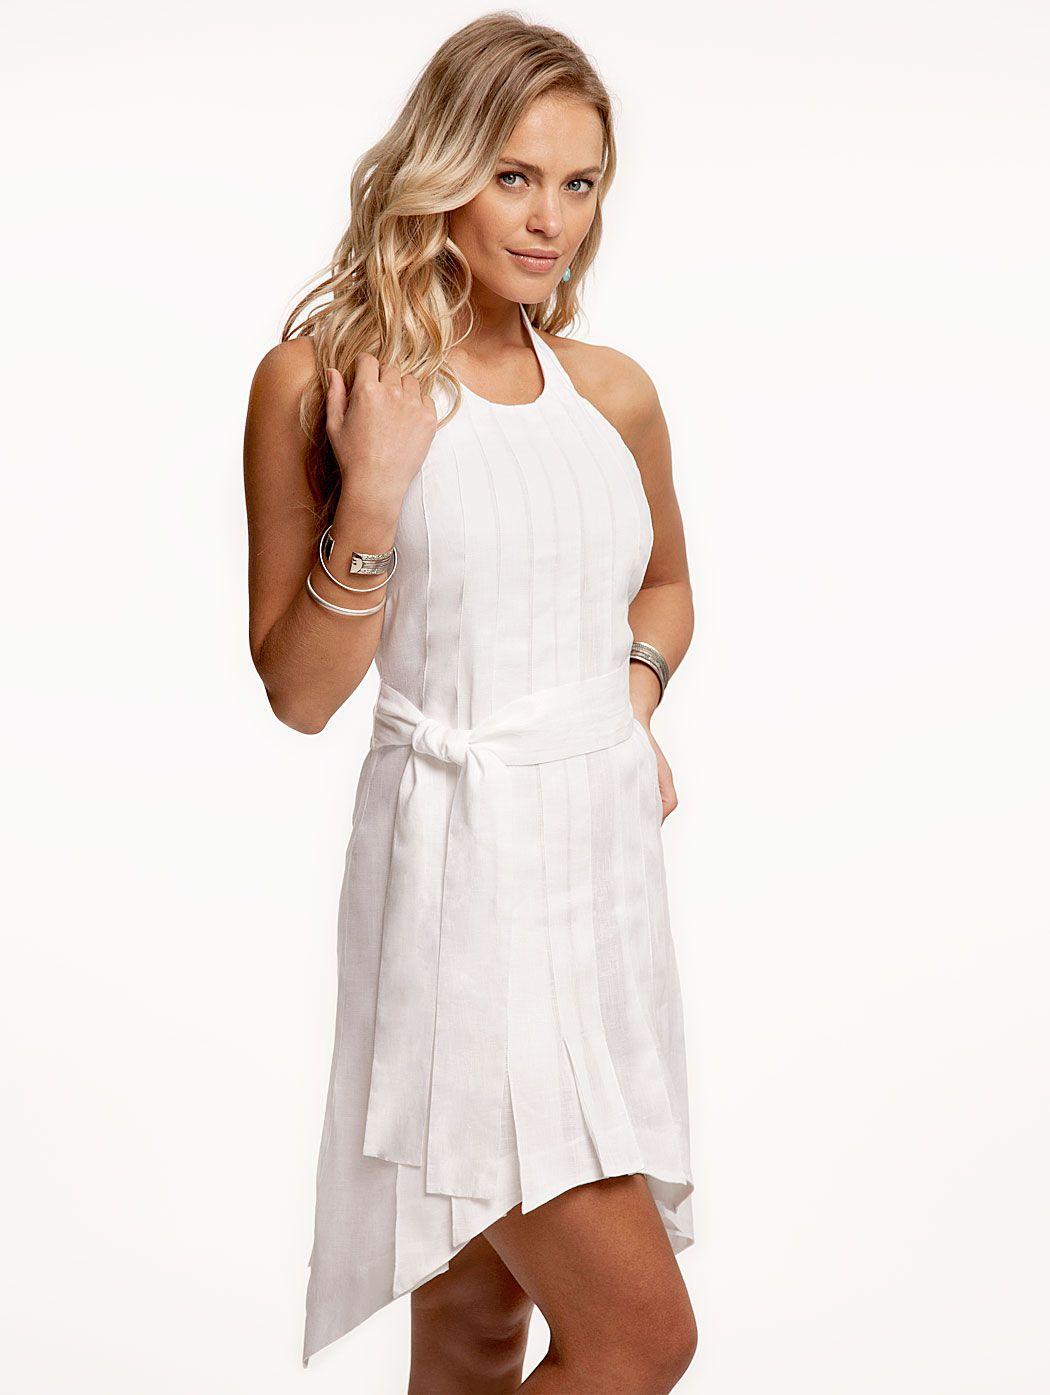 Island Company Dresses